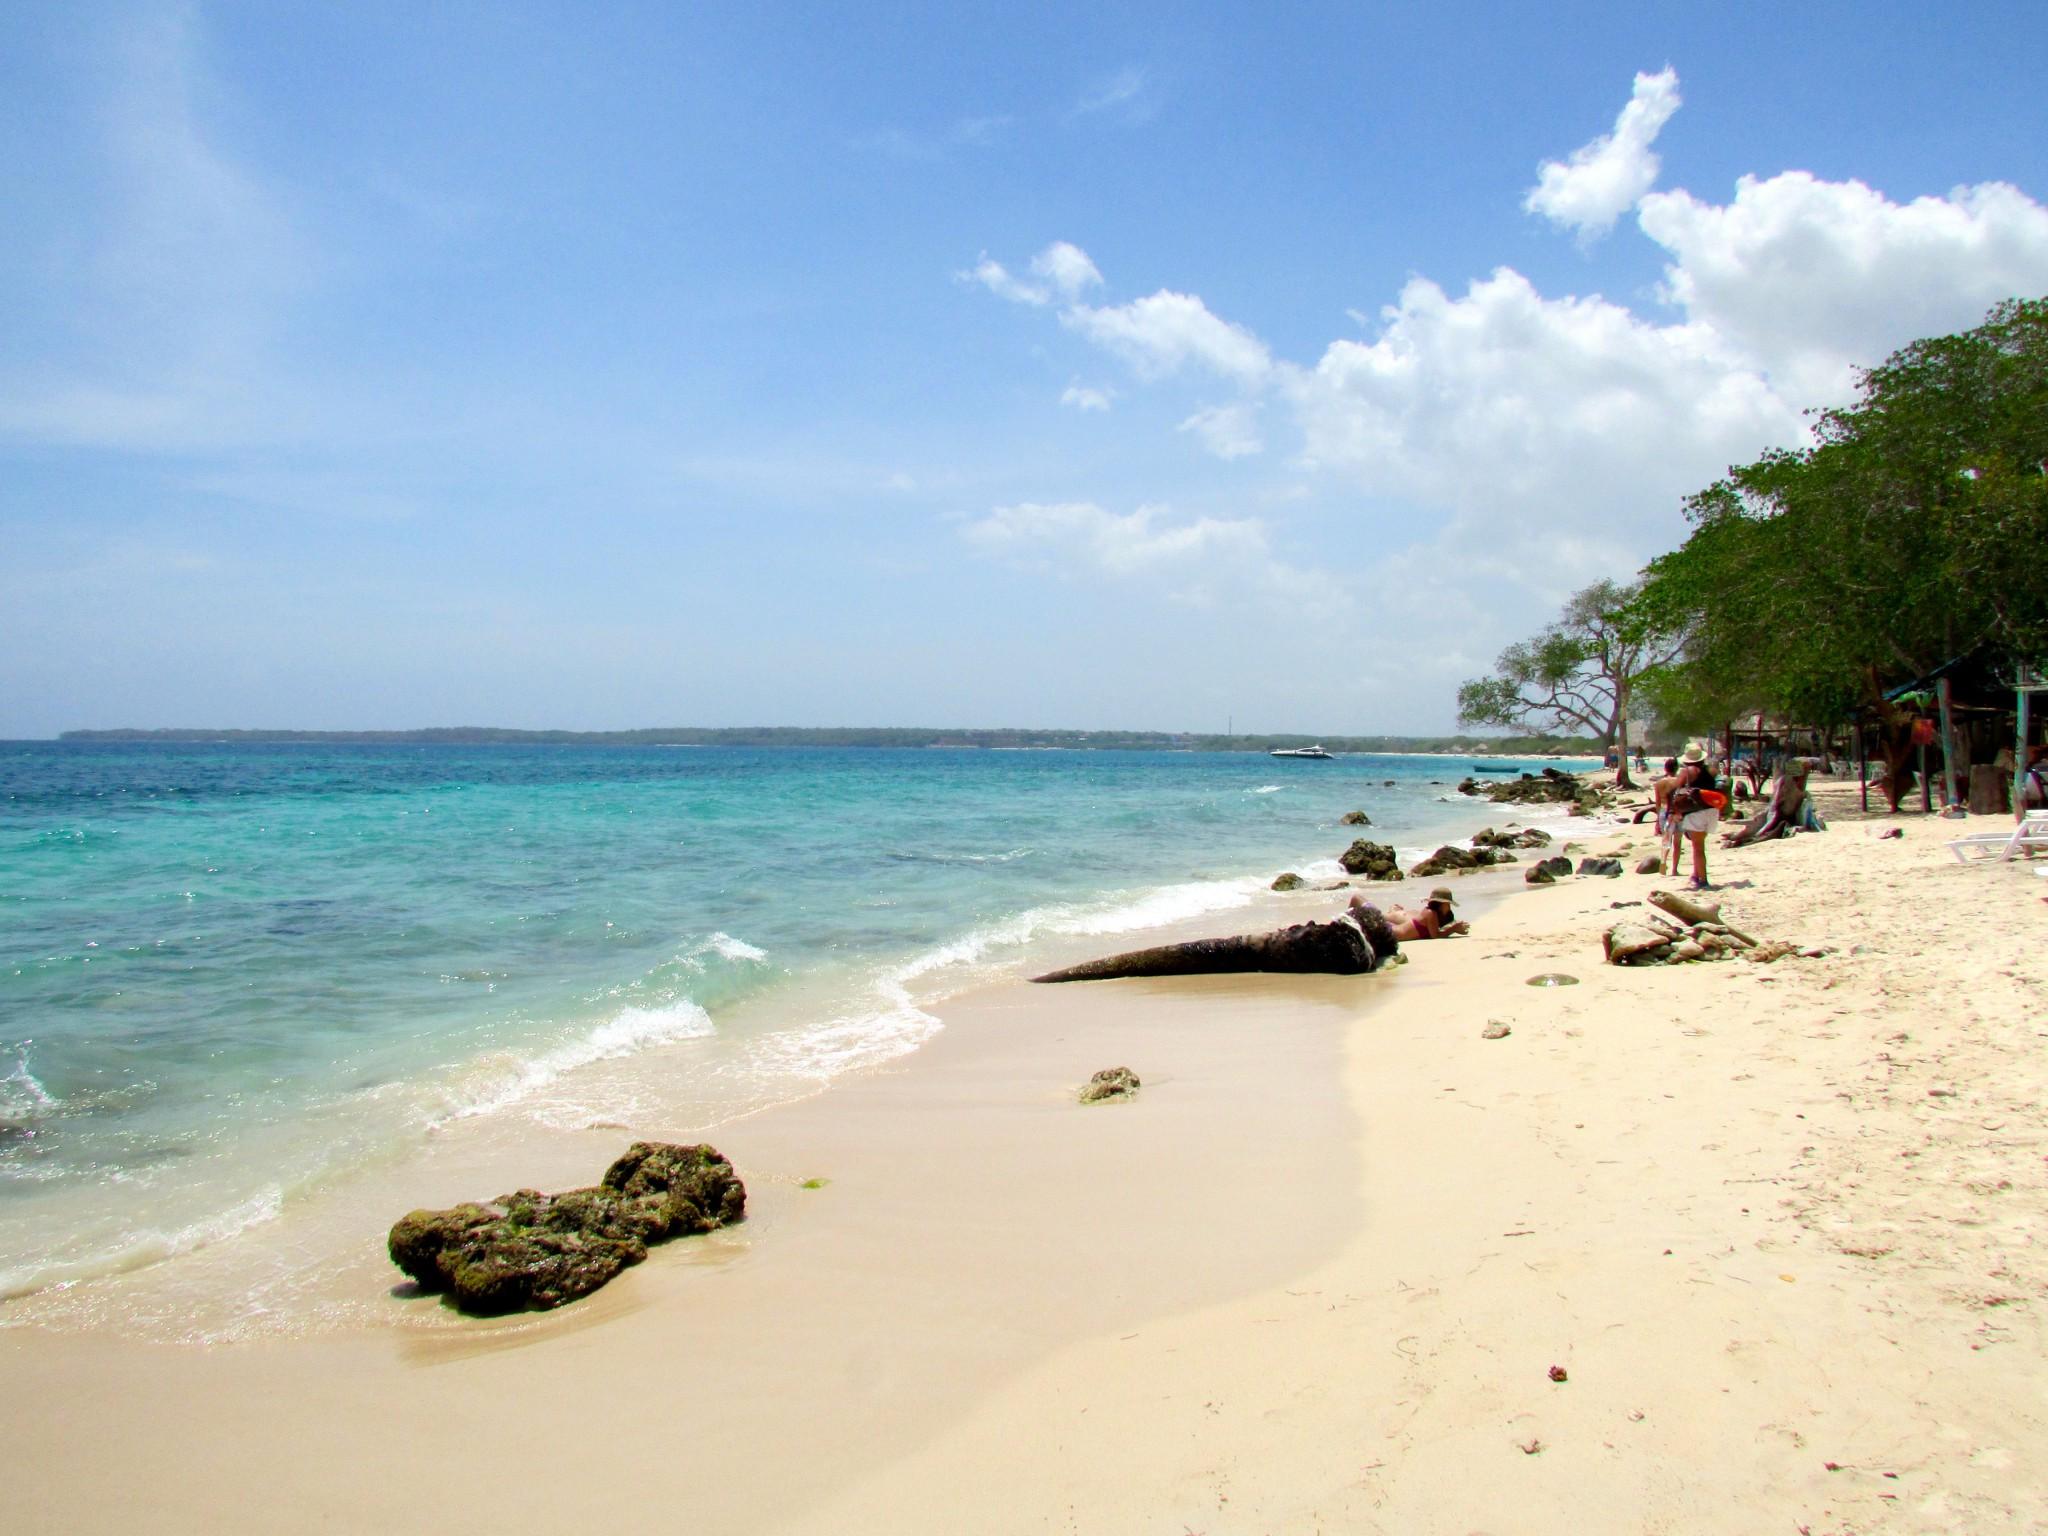 beach playa blanca colombia